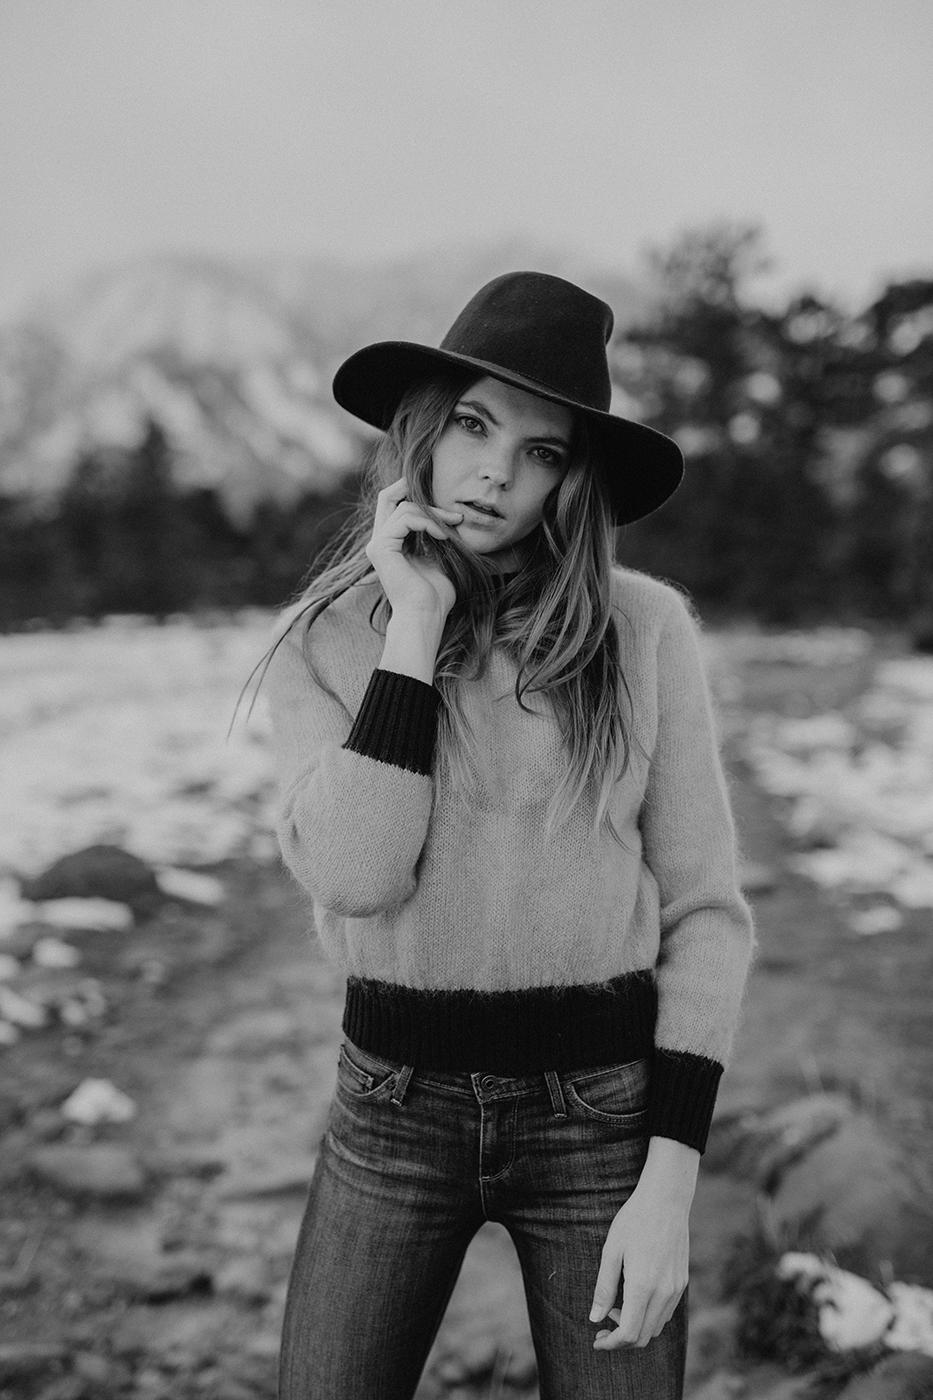 boulder-colorado-winter-snowy-trail-portrait-photographer-00002.jpg